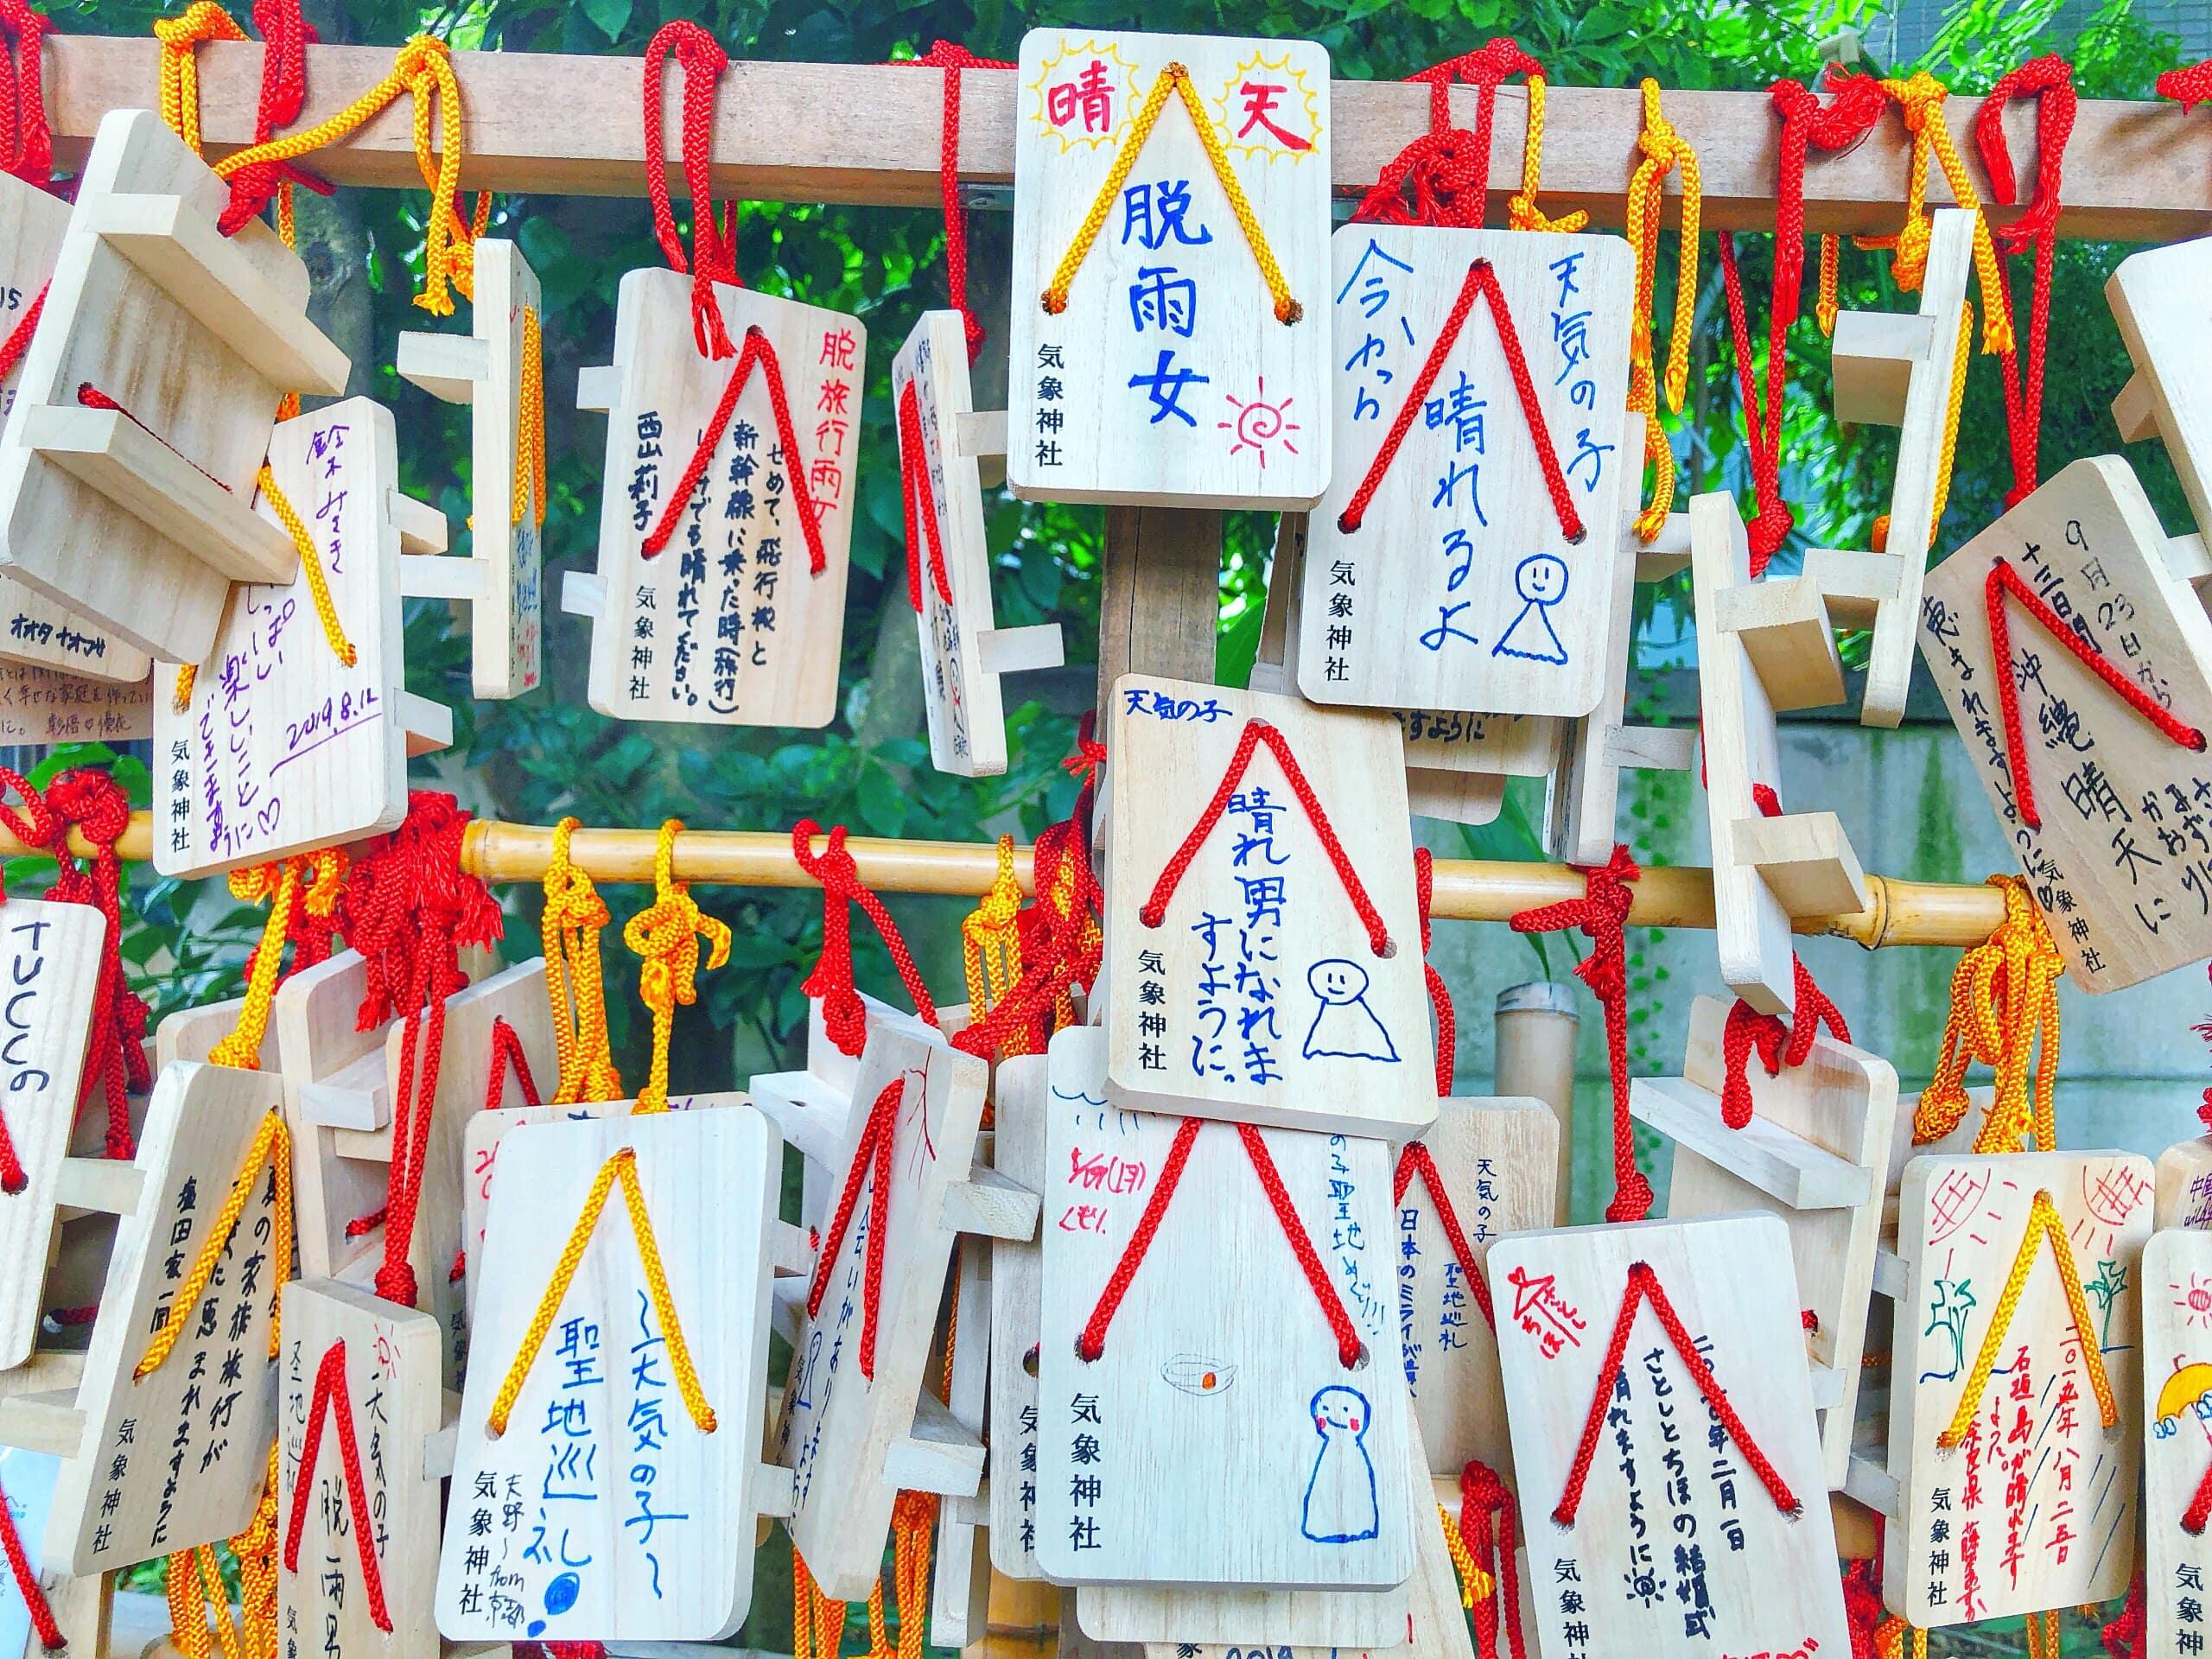 Koenji Hikawa Shrine (高円寺氷川神社)